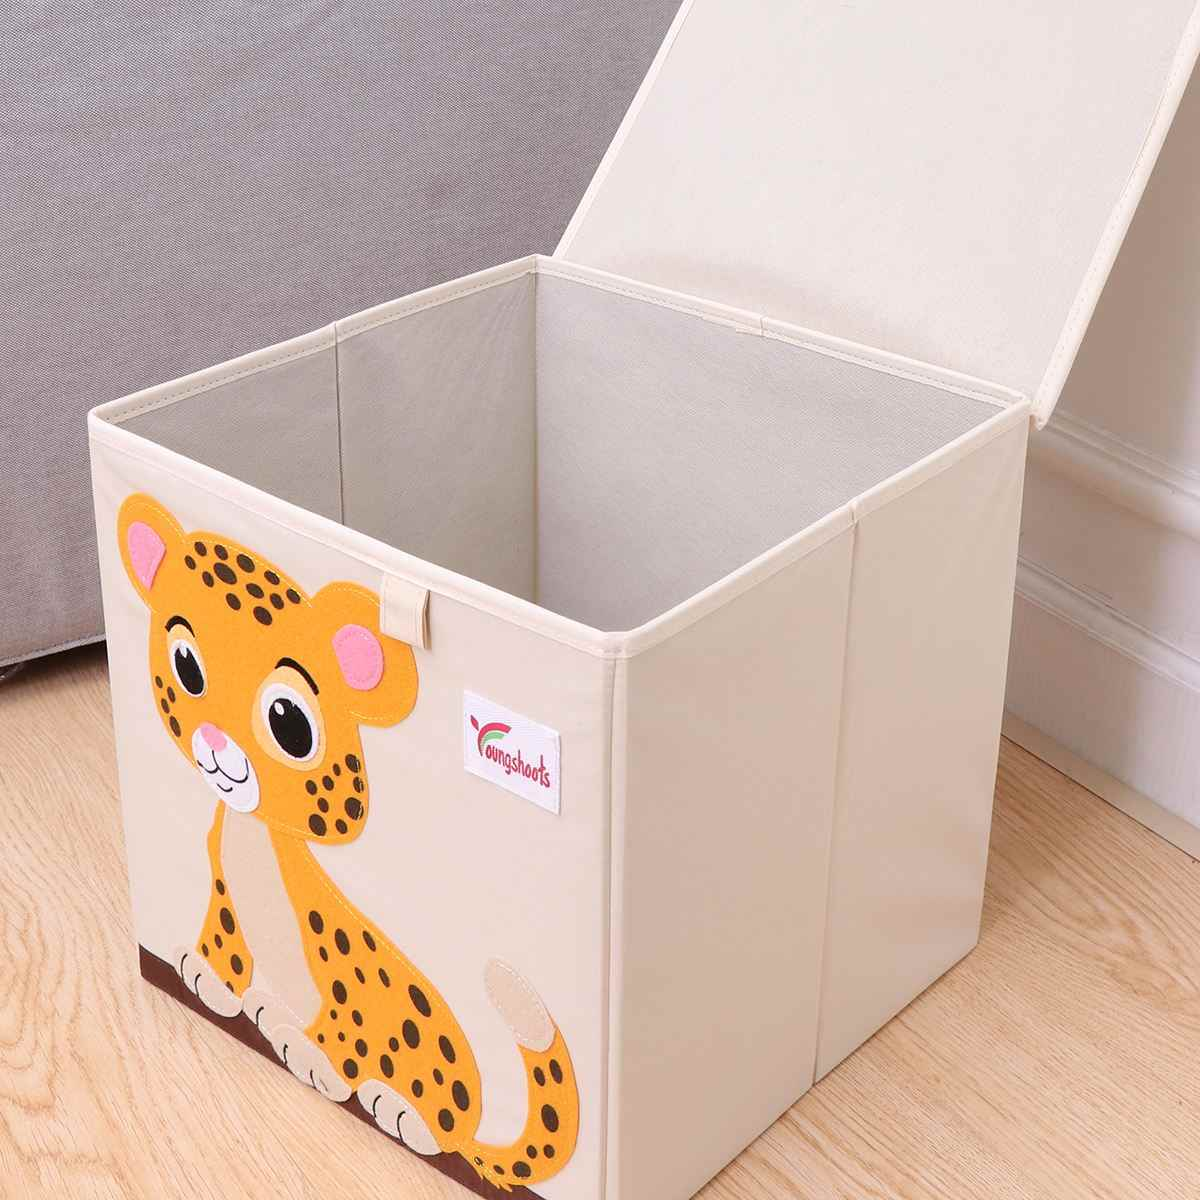 1pc Home Clothes Storage Box Washable Childrens Toy Storage Cube Book Organizer Aliexpress